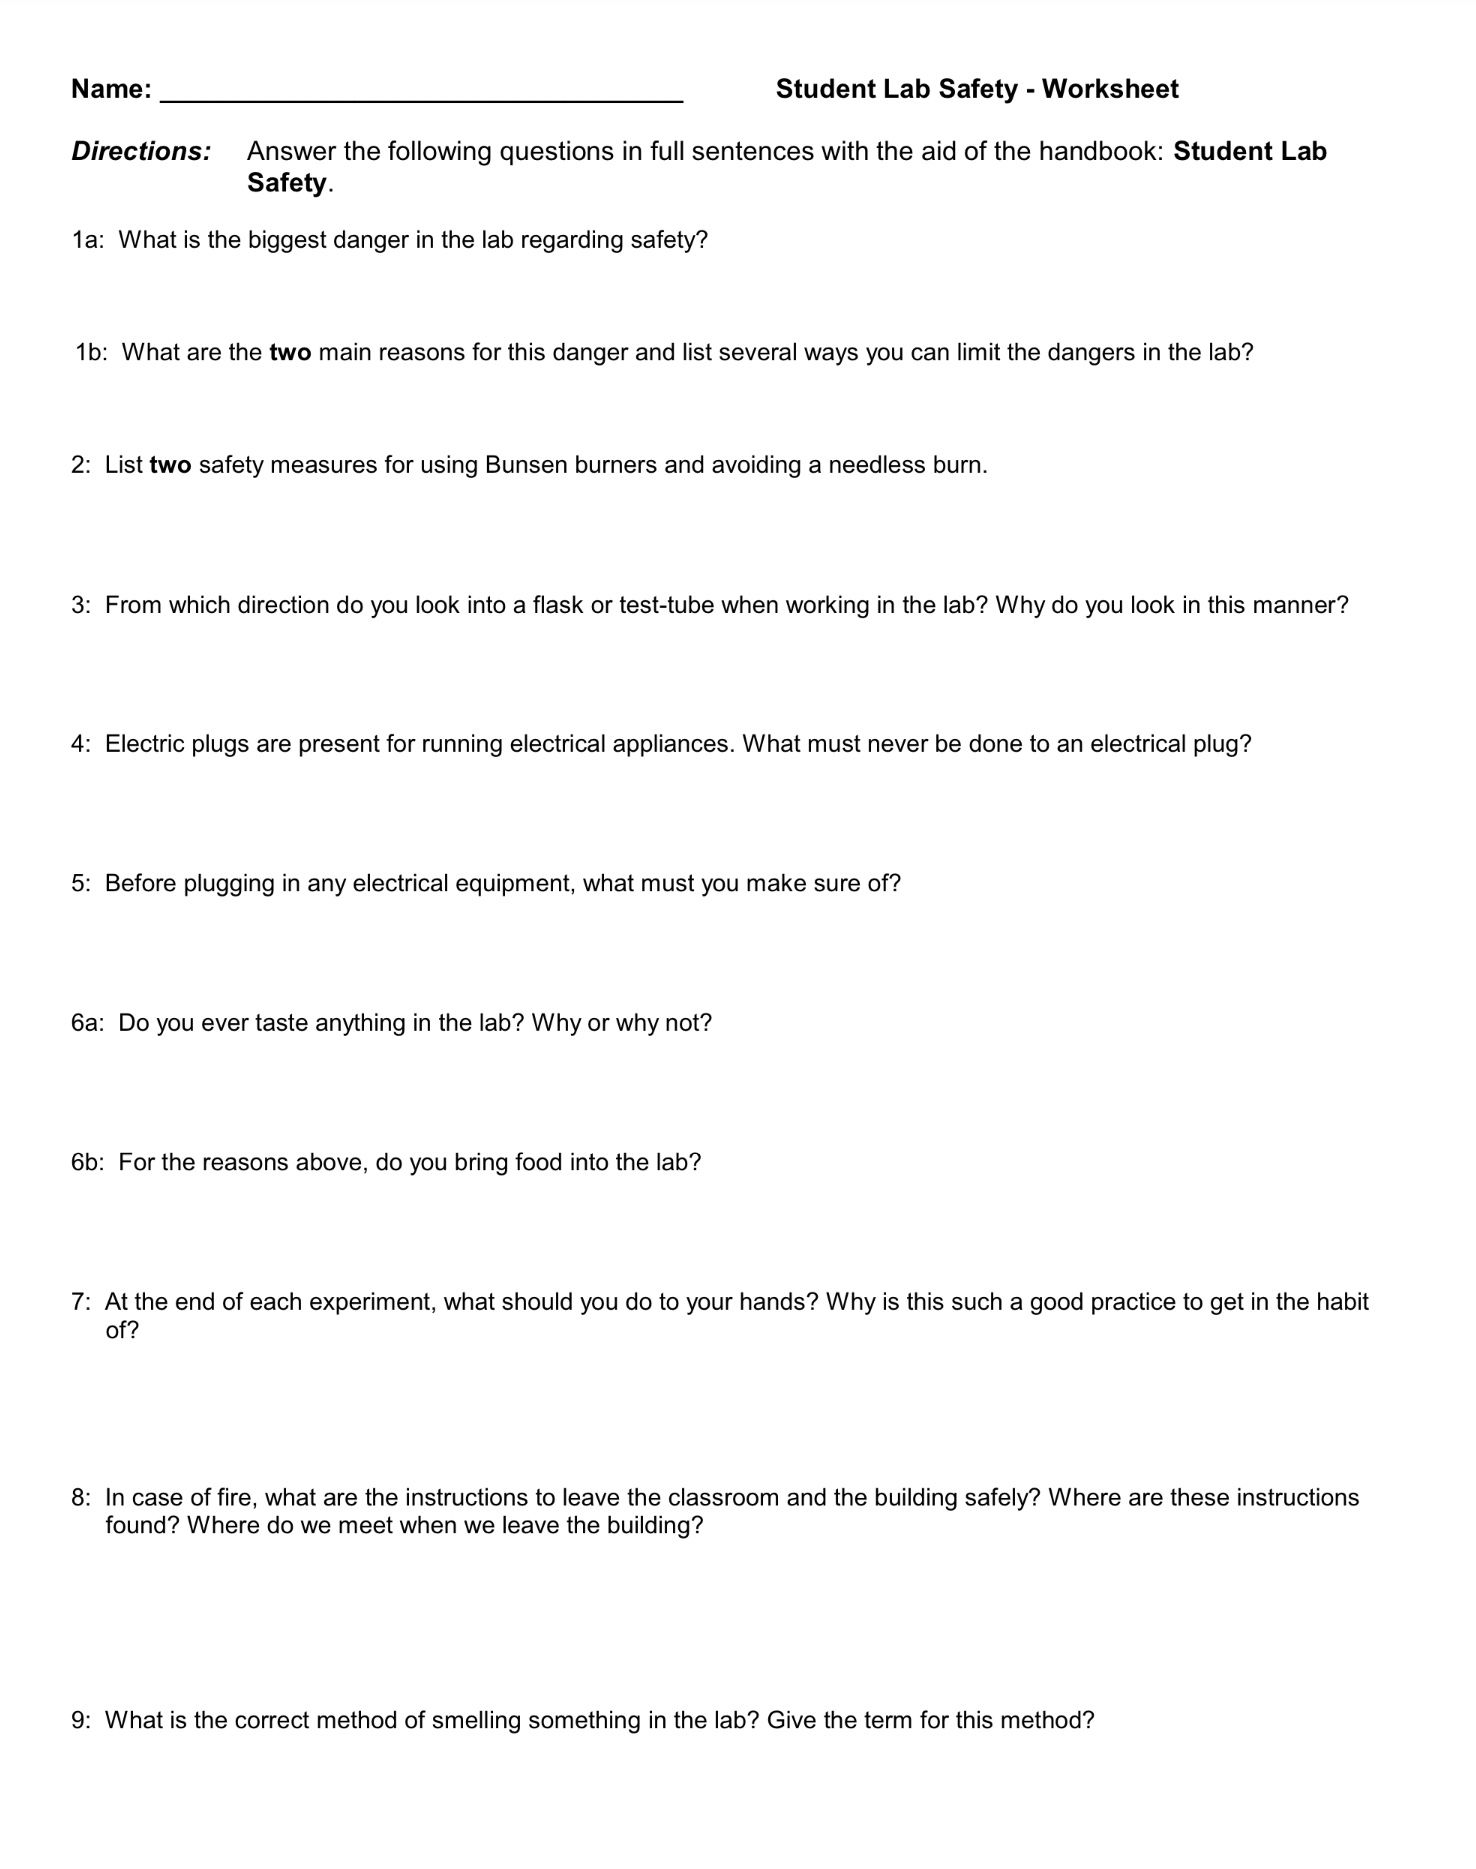 Student Lab Safety Worksheet